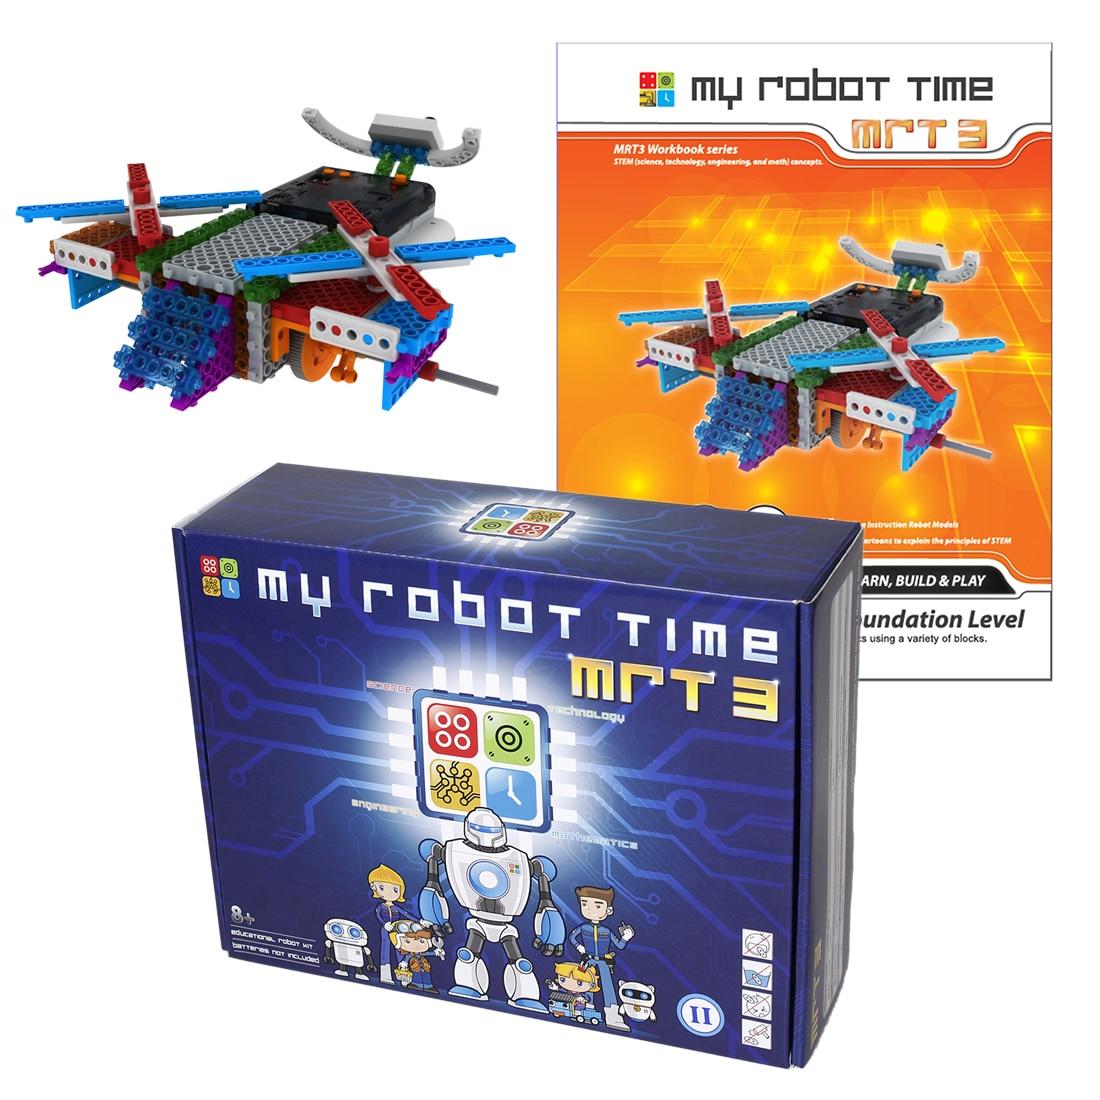 My Robot Time Multi-mode DIY Programmable Robots Building Block Kit Assembly Robot Toy For Age 7+ (MRT 3-1 Foundation Level)